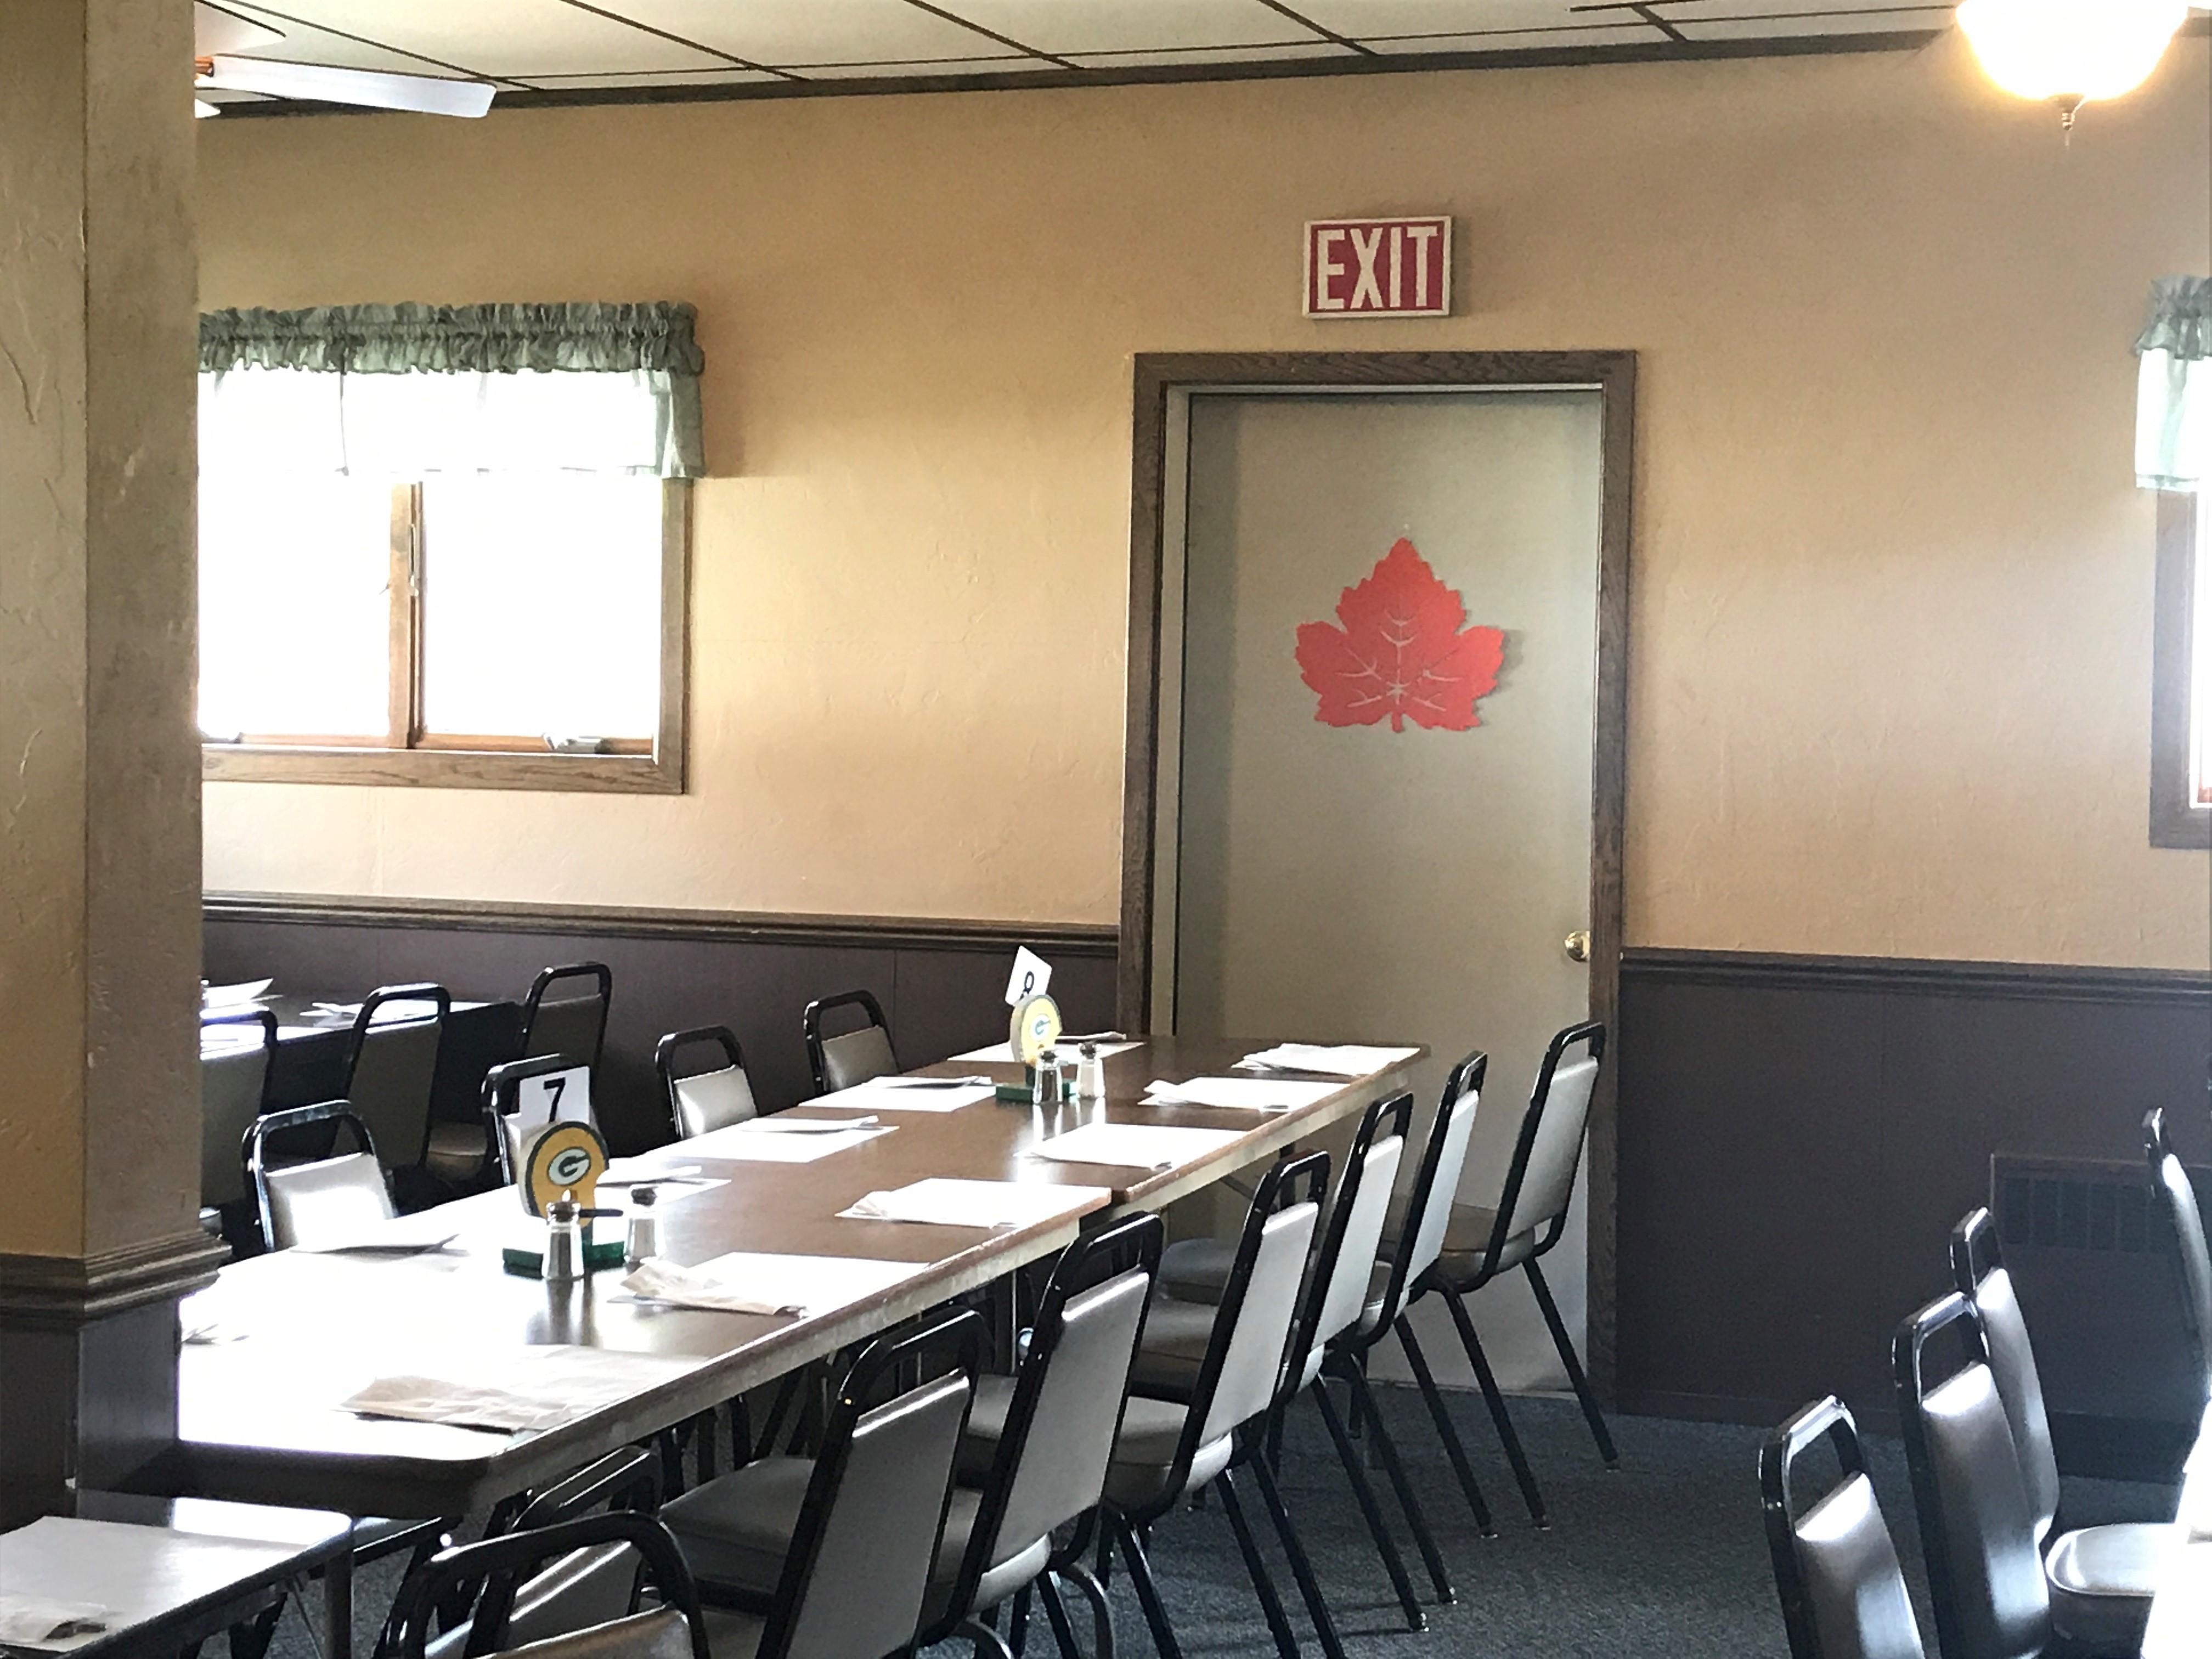 Hit and run damages Kewaunee Co restaurant